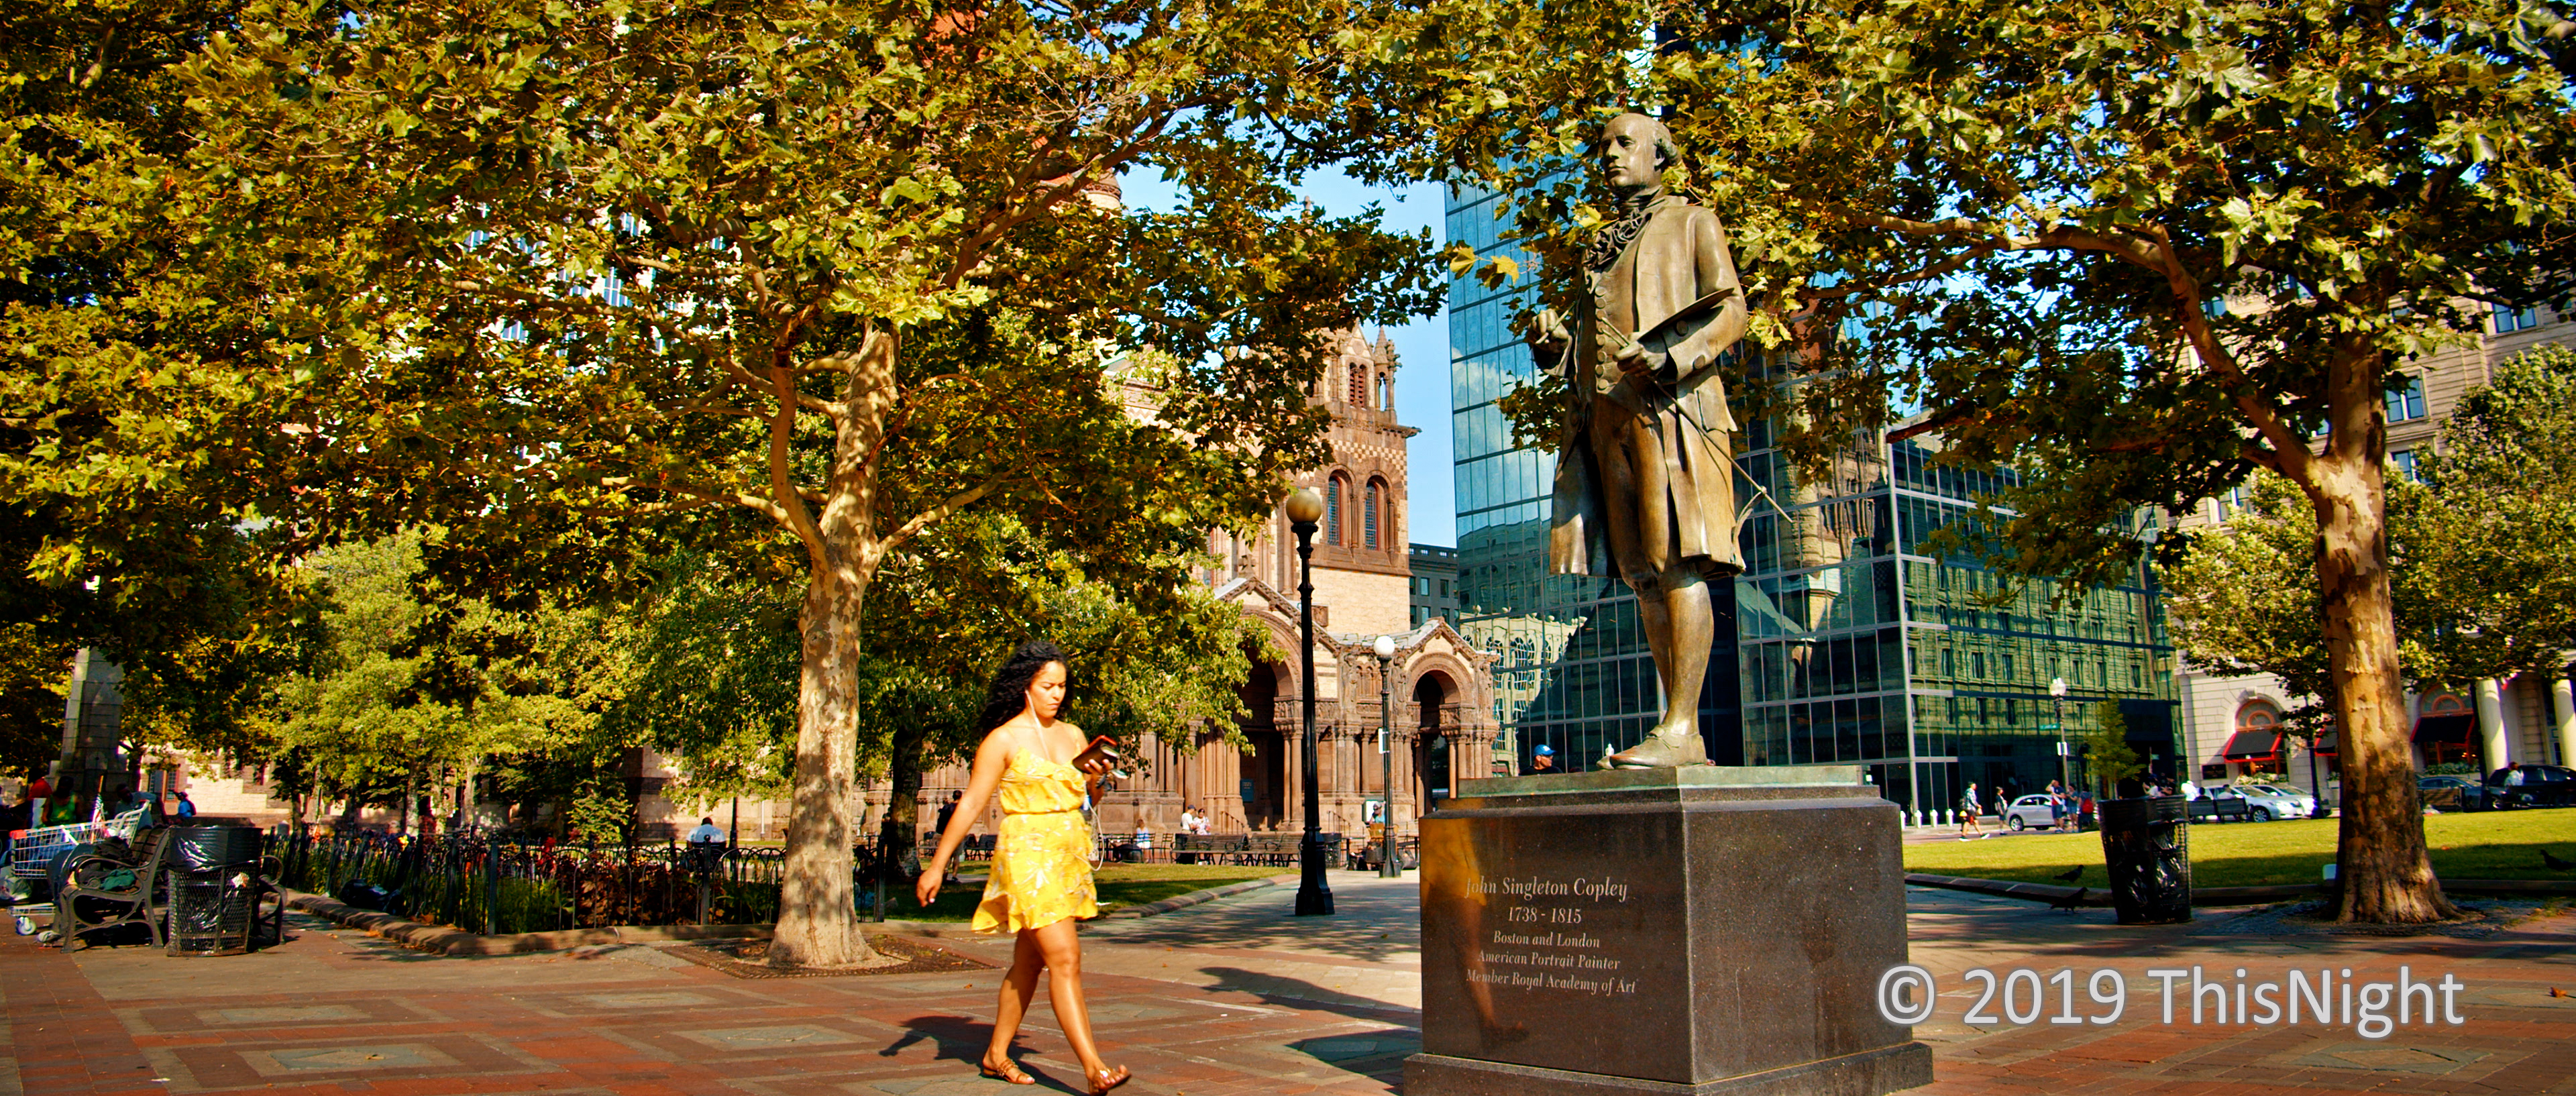 Introduction of Boston_00115